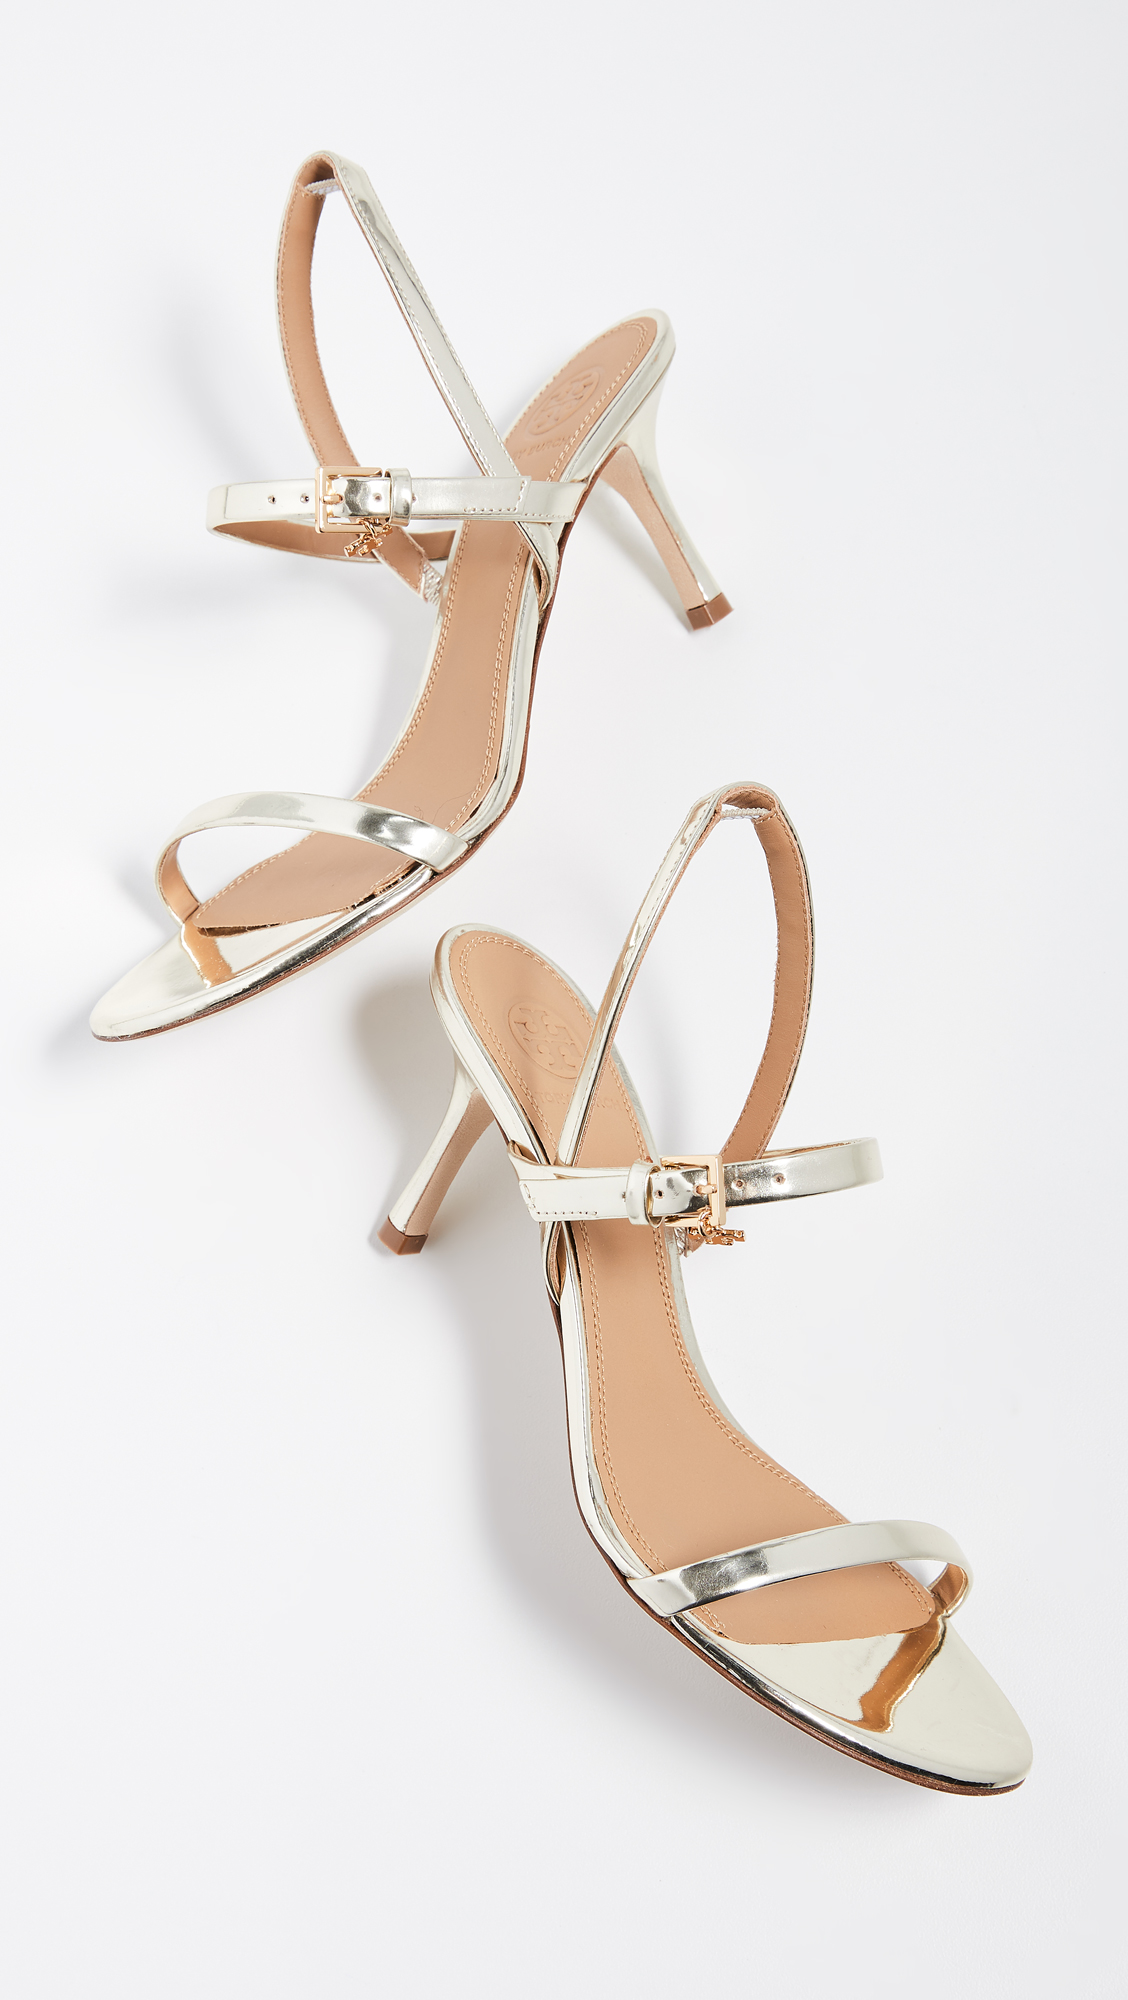 d554c8ecb3d7 Tory Burch Penelope Slingback Sandals